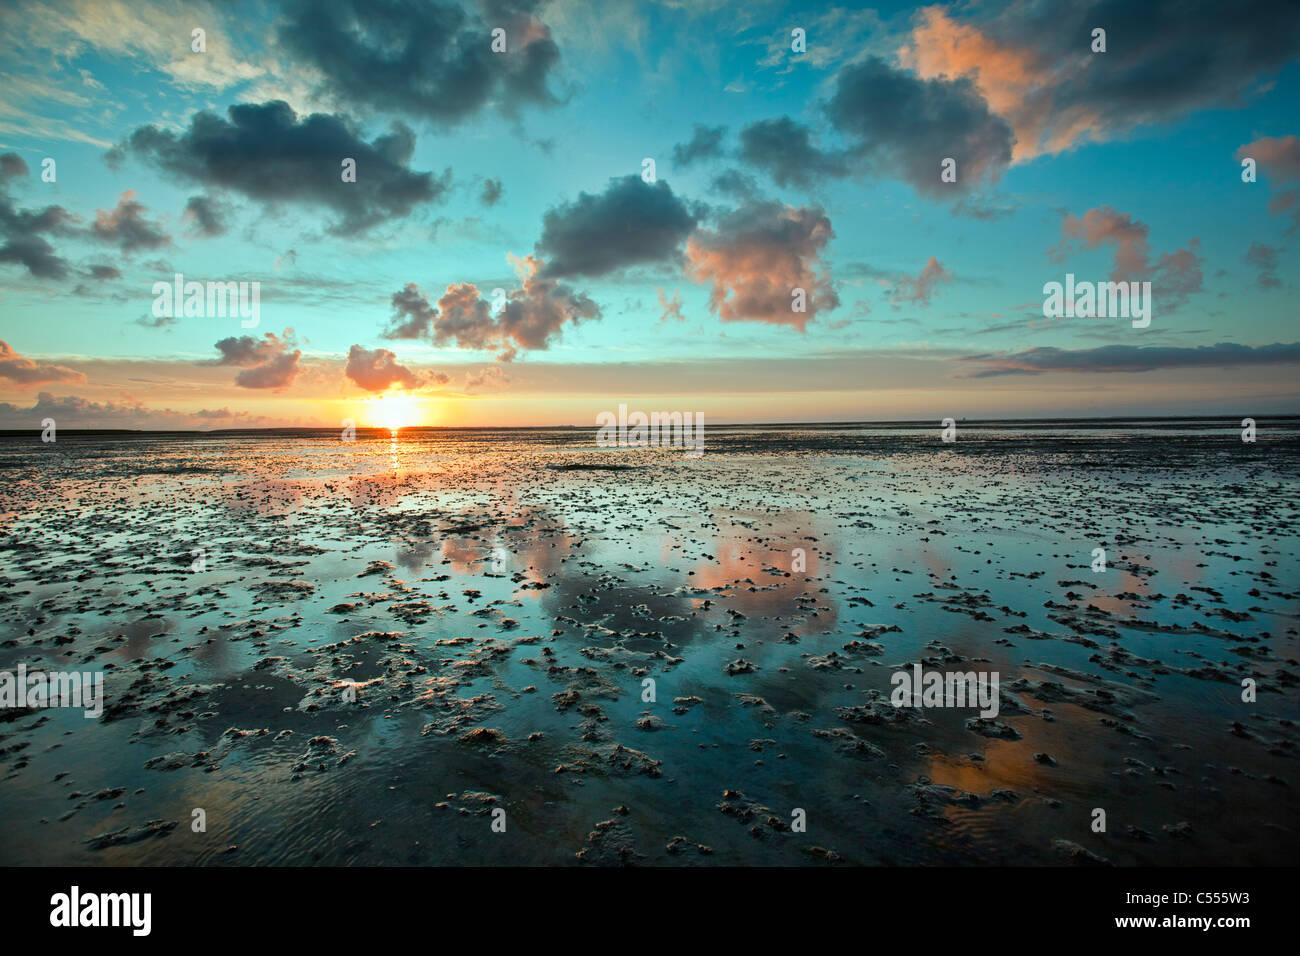 Die Niederlande, Buren, Ameland Insel, gehört zum Wadden Sea Islands. UNESCO-Weltkulturerbe. Watten. Sunrise. Stockbild